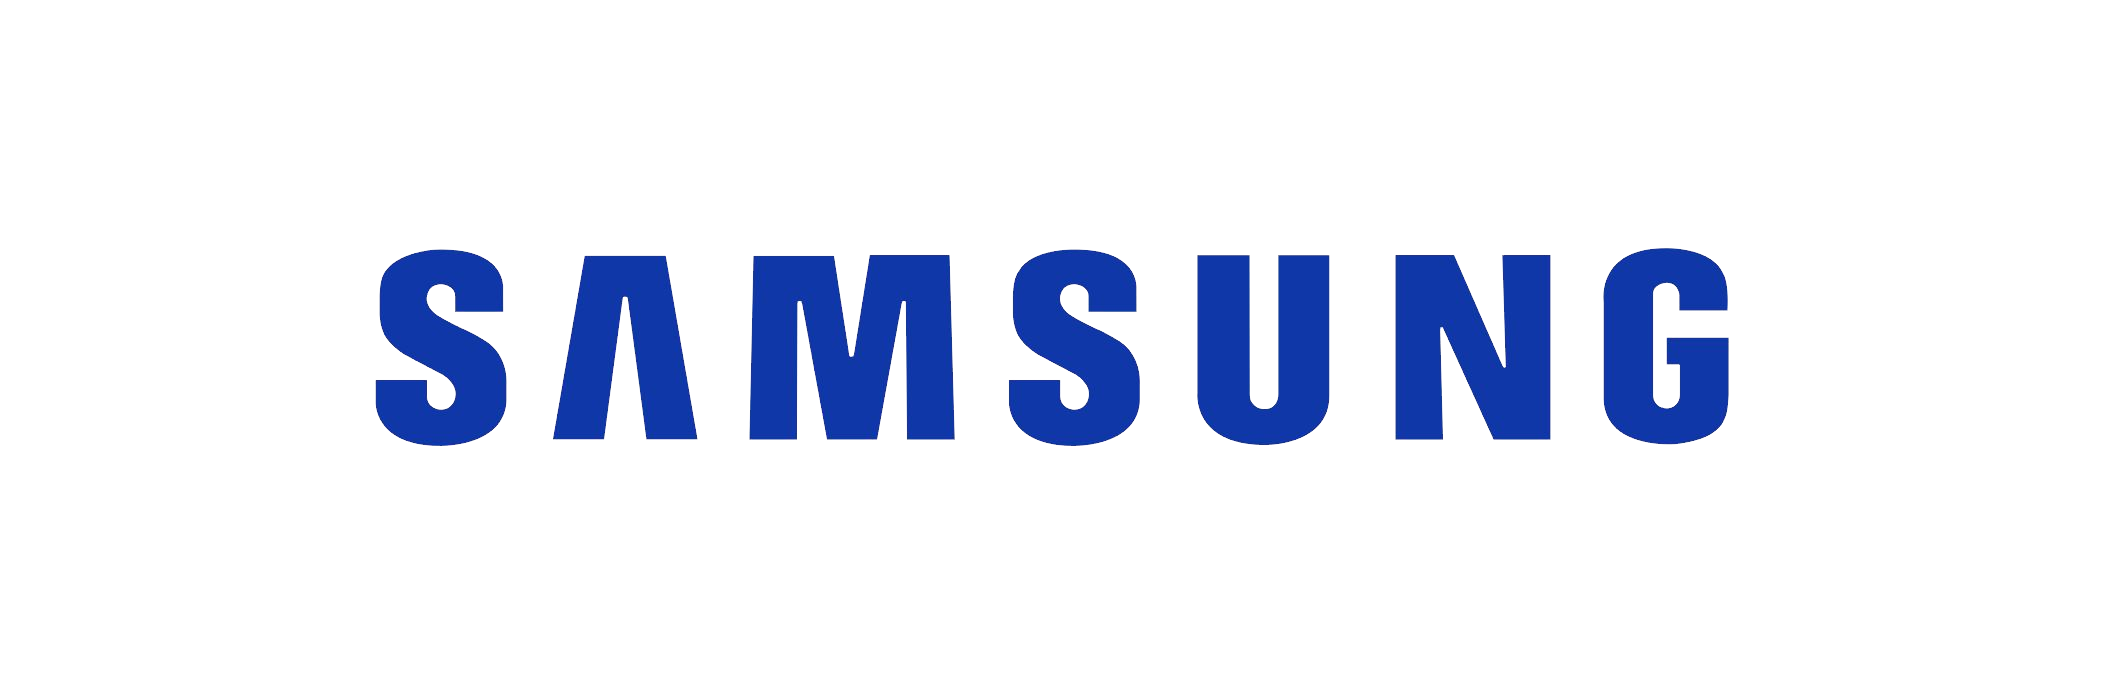 samsung_logo_PNG3.jpg